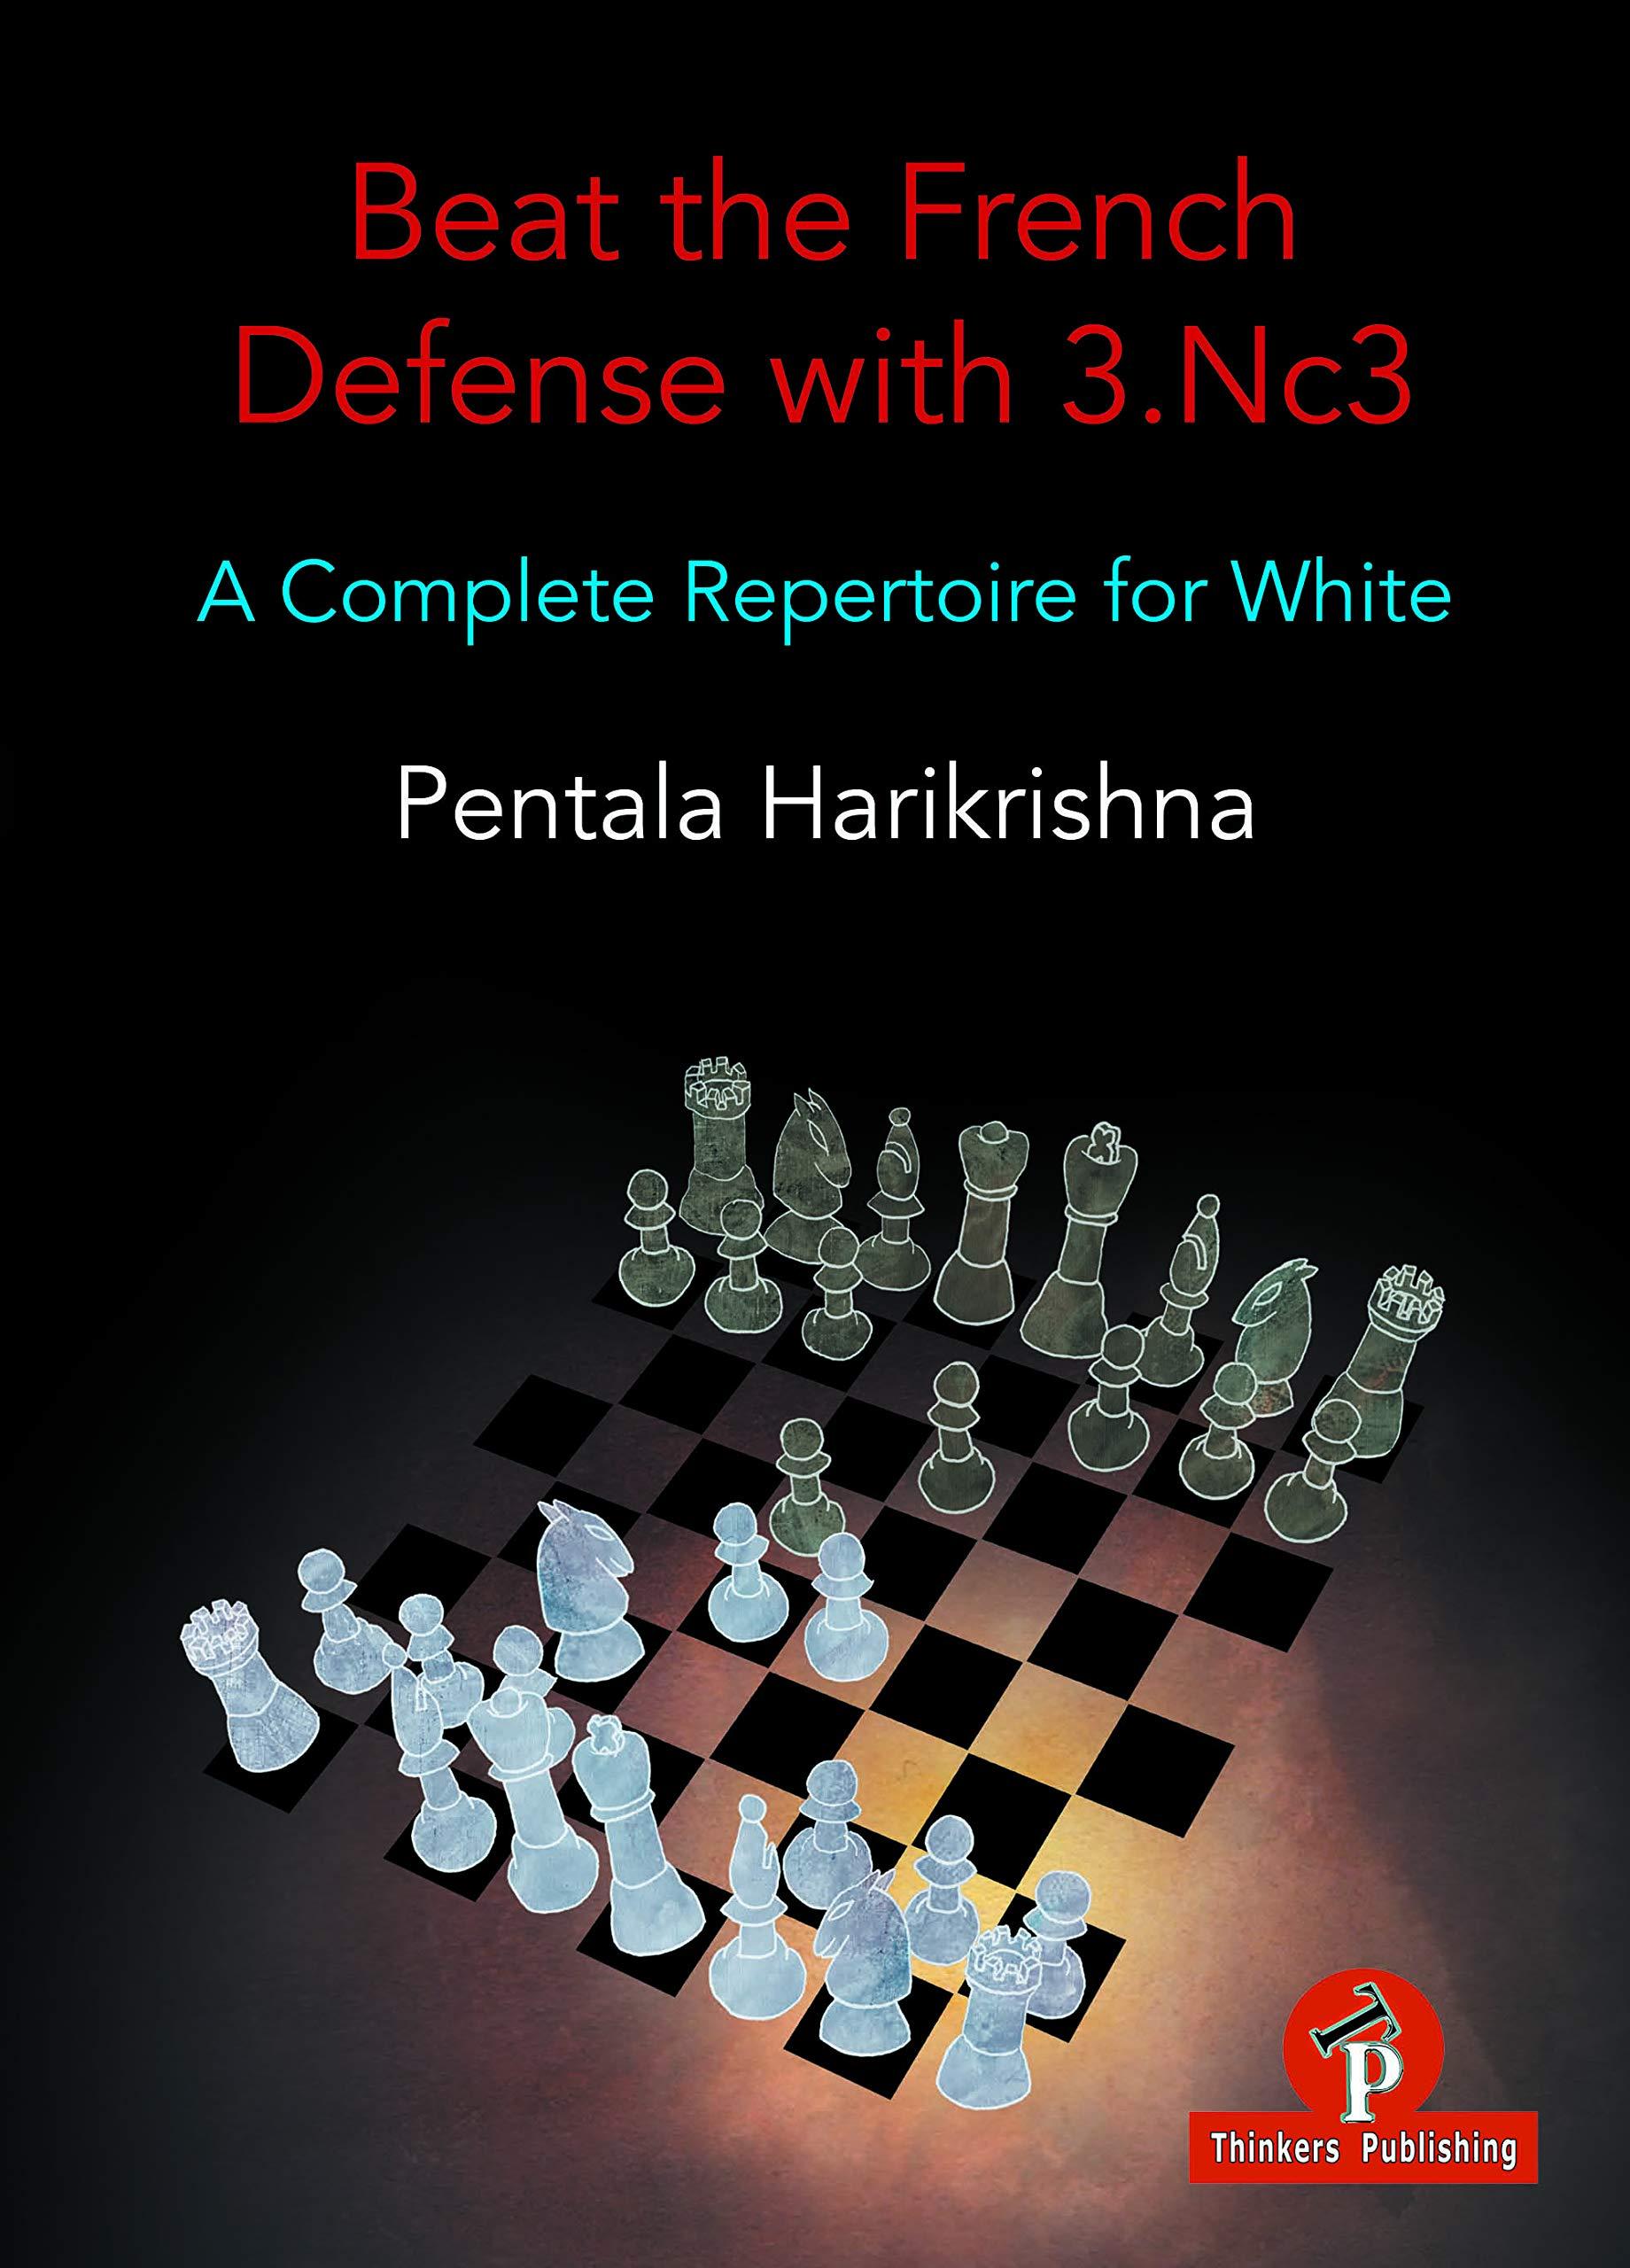 Beat the French Defense with 3.Nc3, Pentala Harikrishna, Thinker's Publishing, 2021, ISBN-13  :  978-9492510976